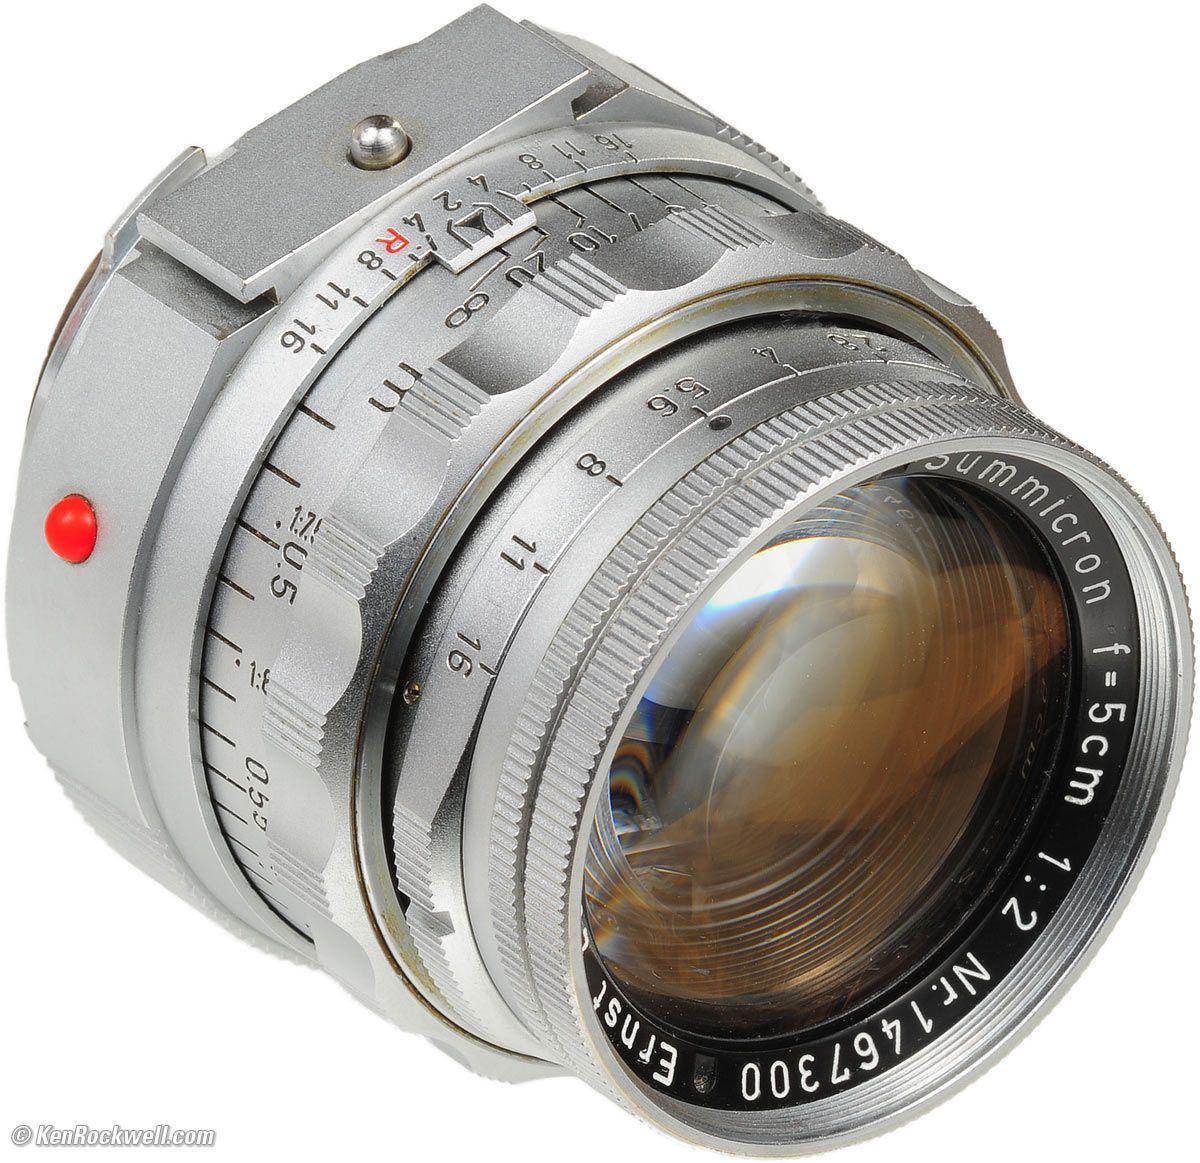 LEICA 50mm f/2 SUMMICRON with Near-Focusing Range